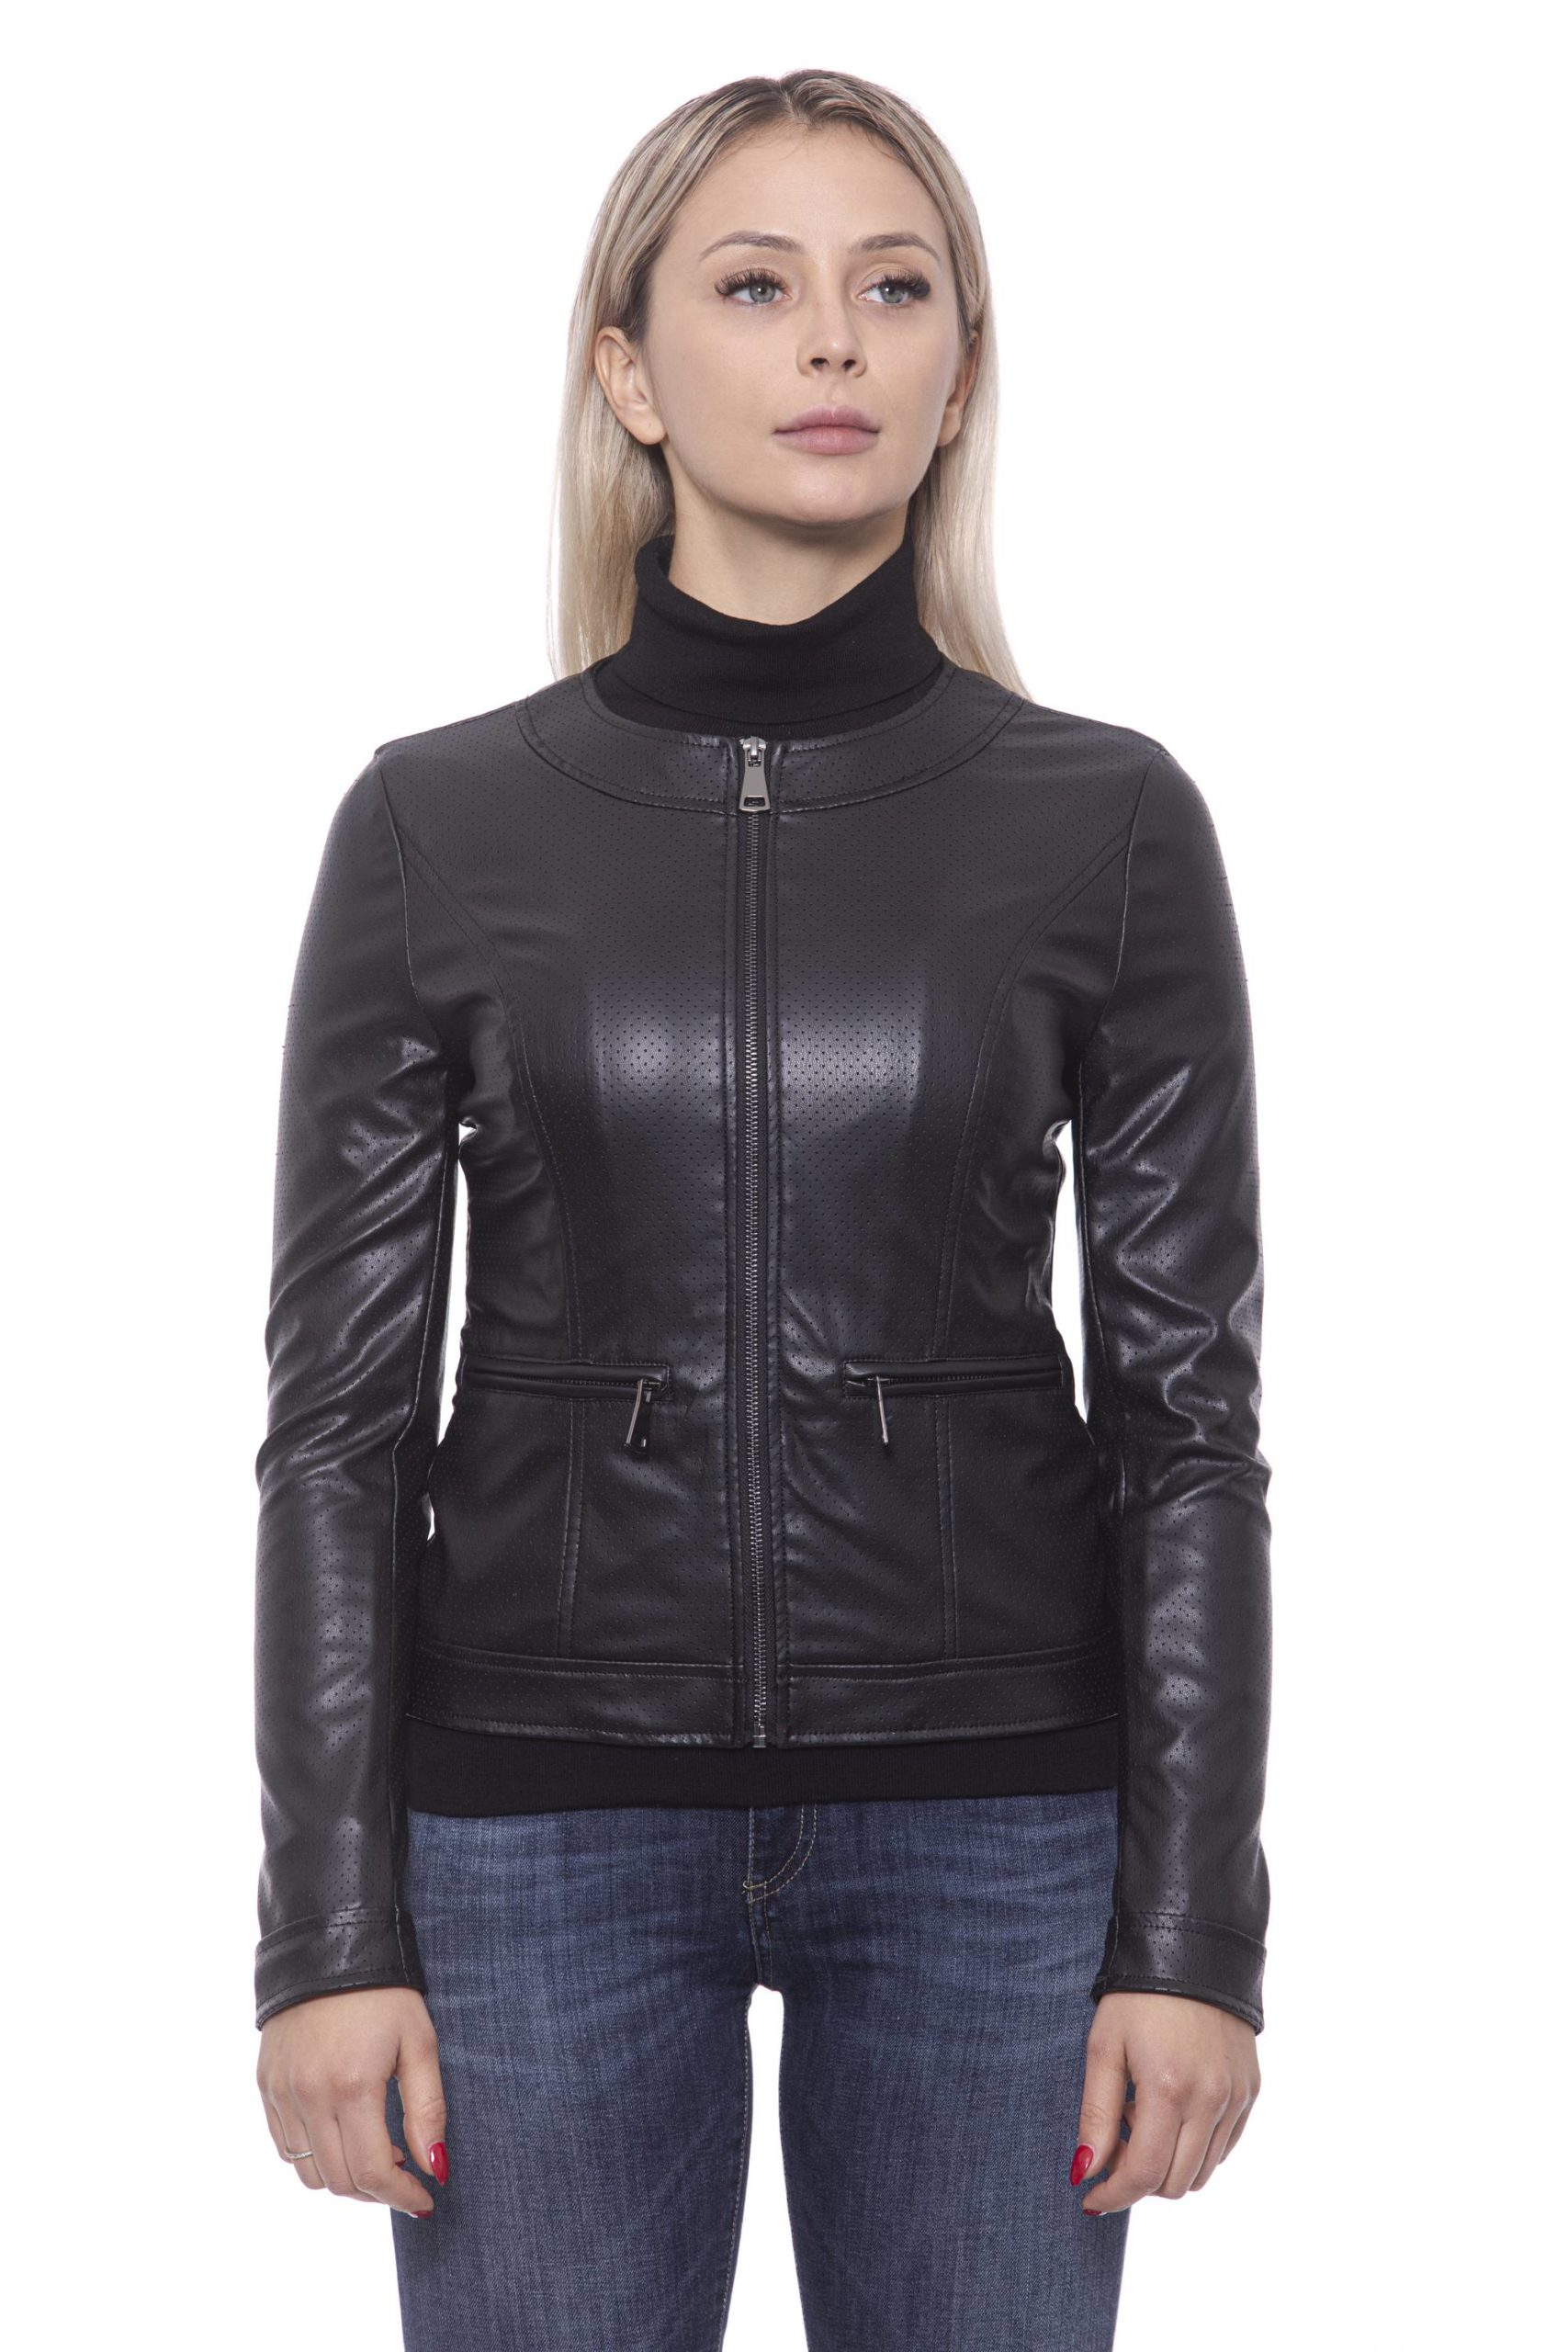 19V69 Italia Women's Nero Jacket 191388278 - M